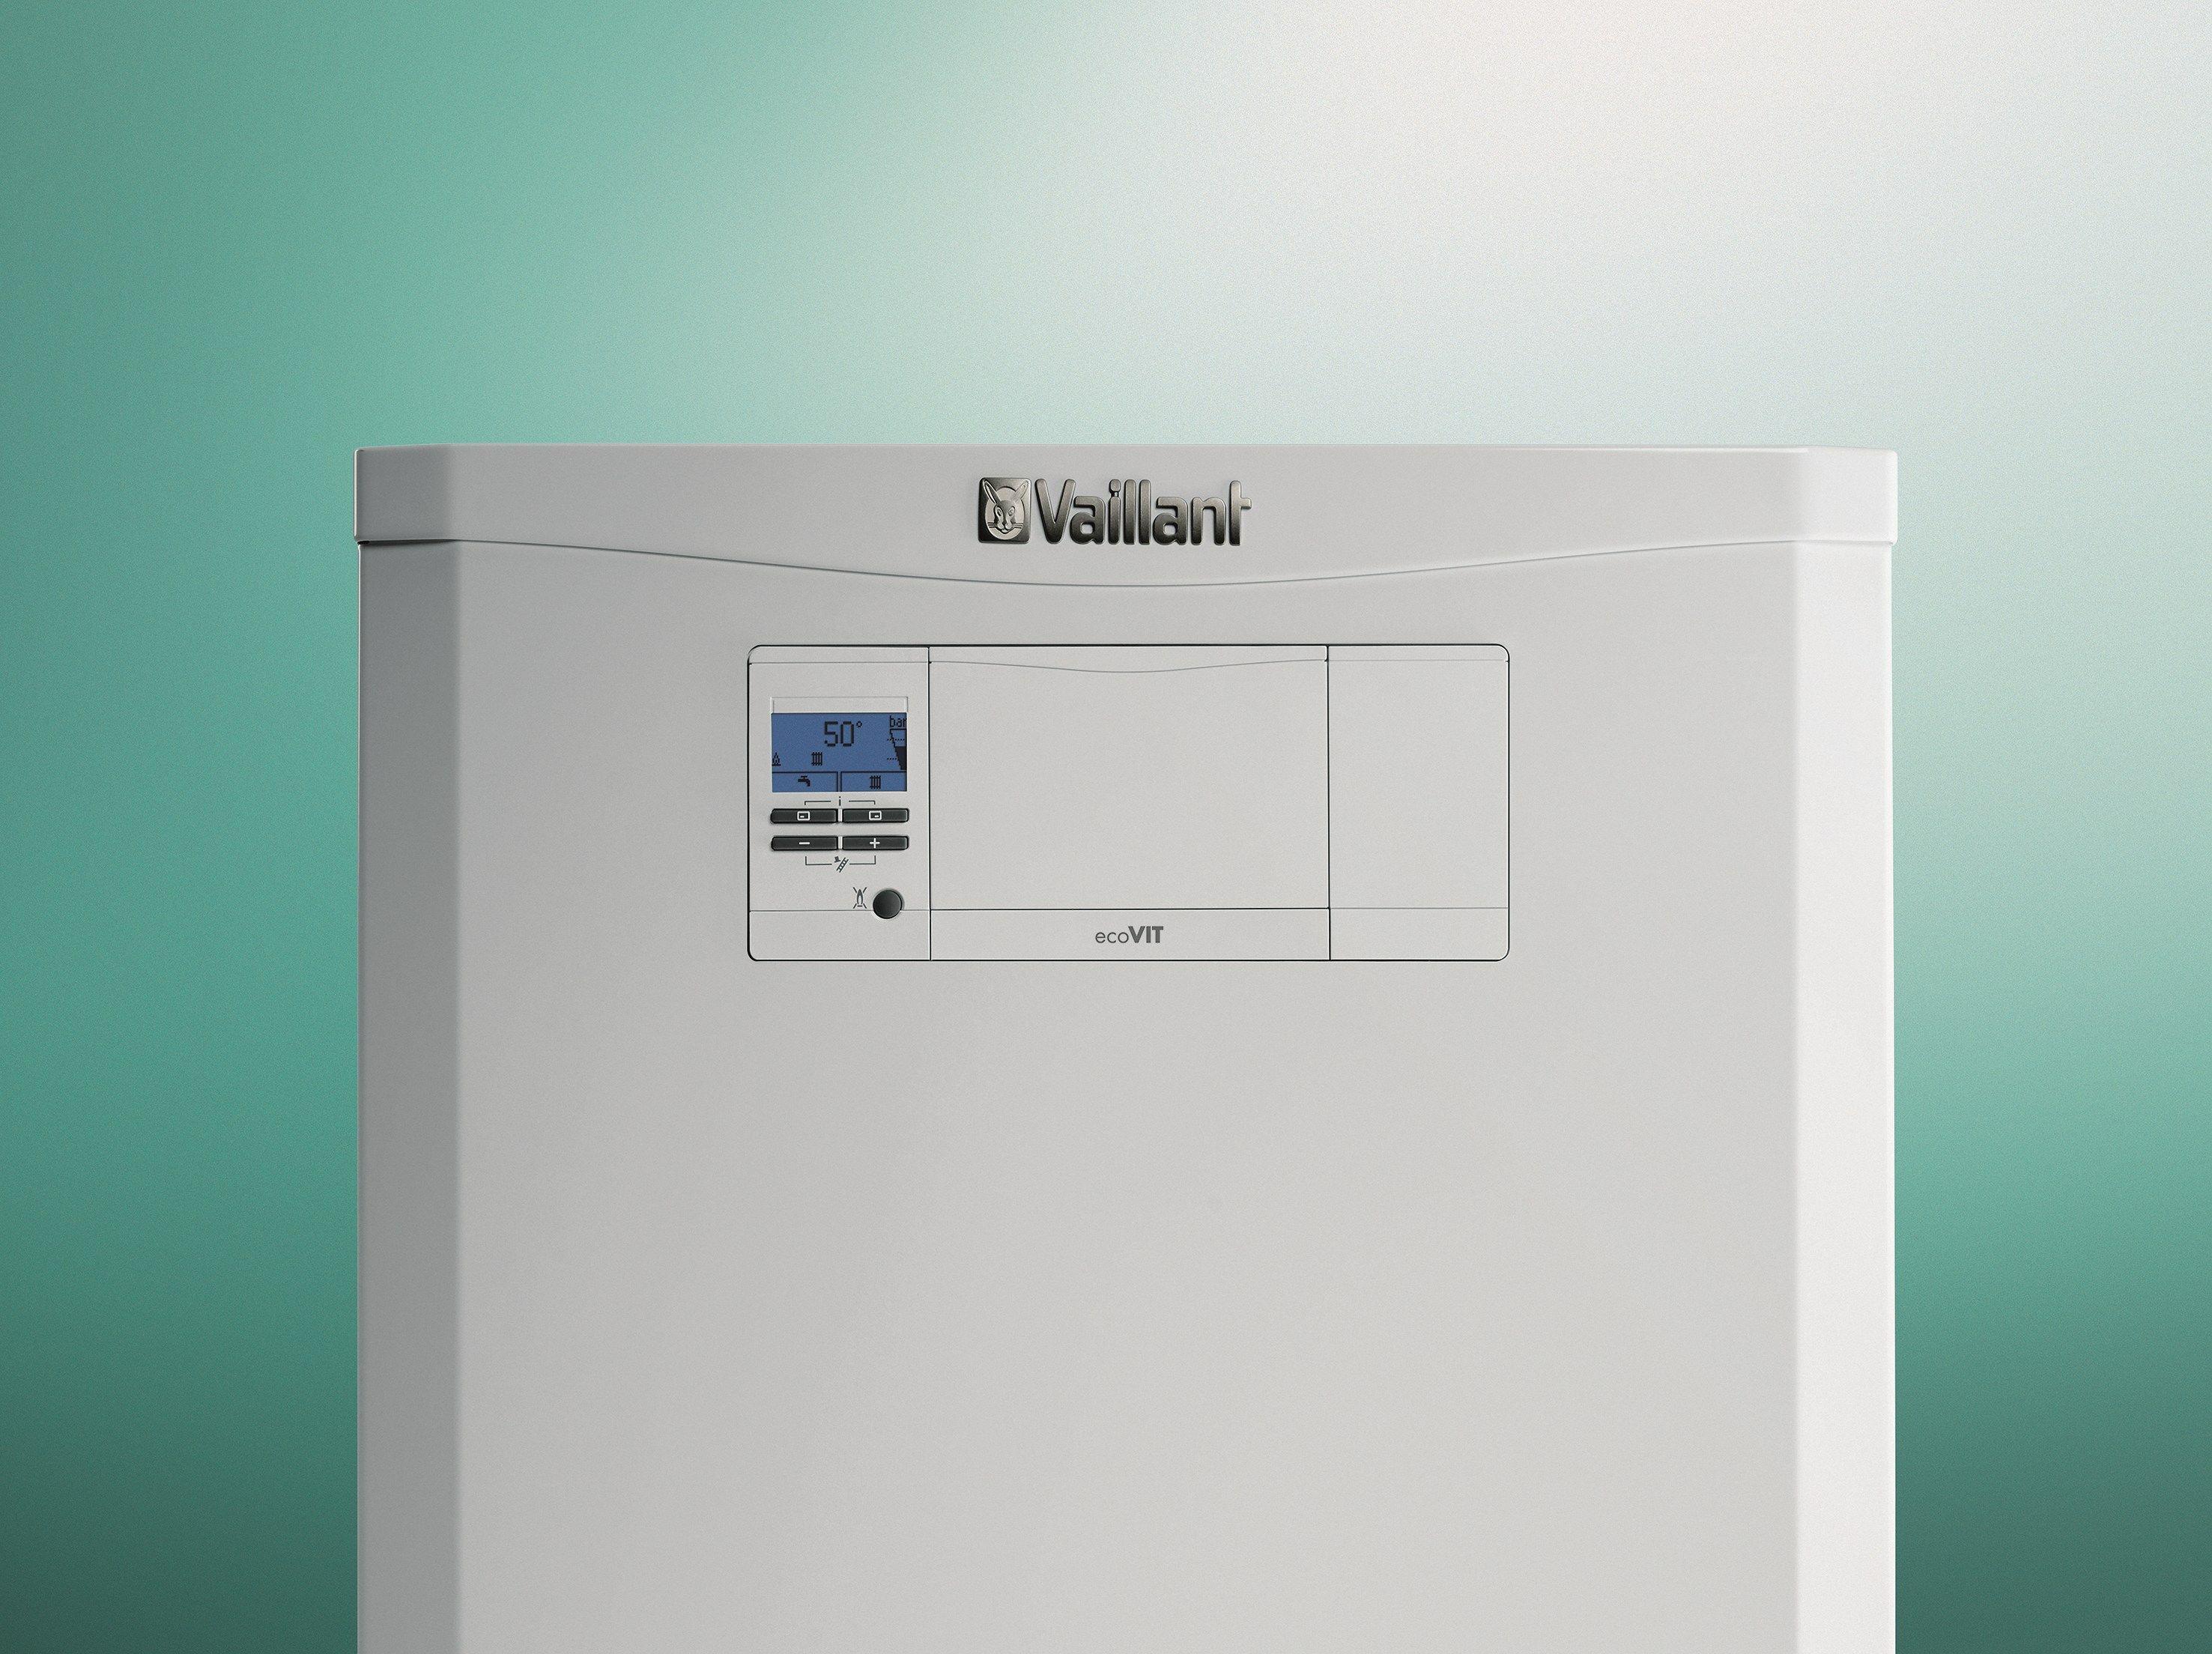 Caldaia a condensazione a basamento ecoVIT VKK by VAILLANT